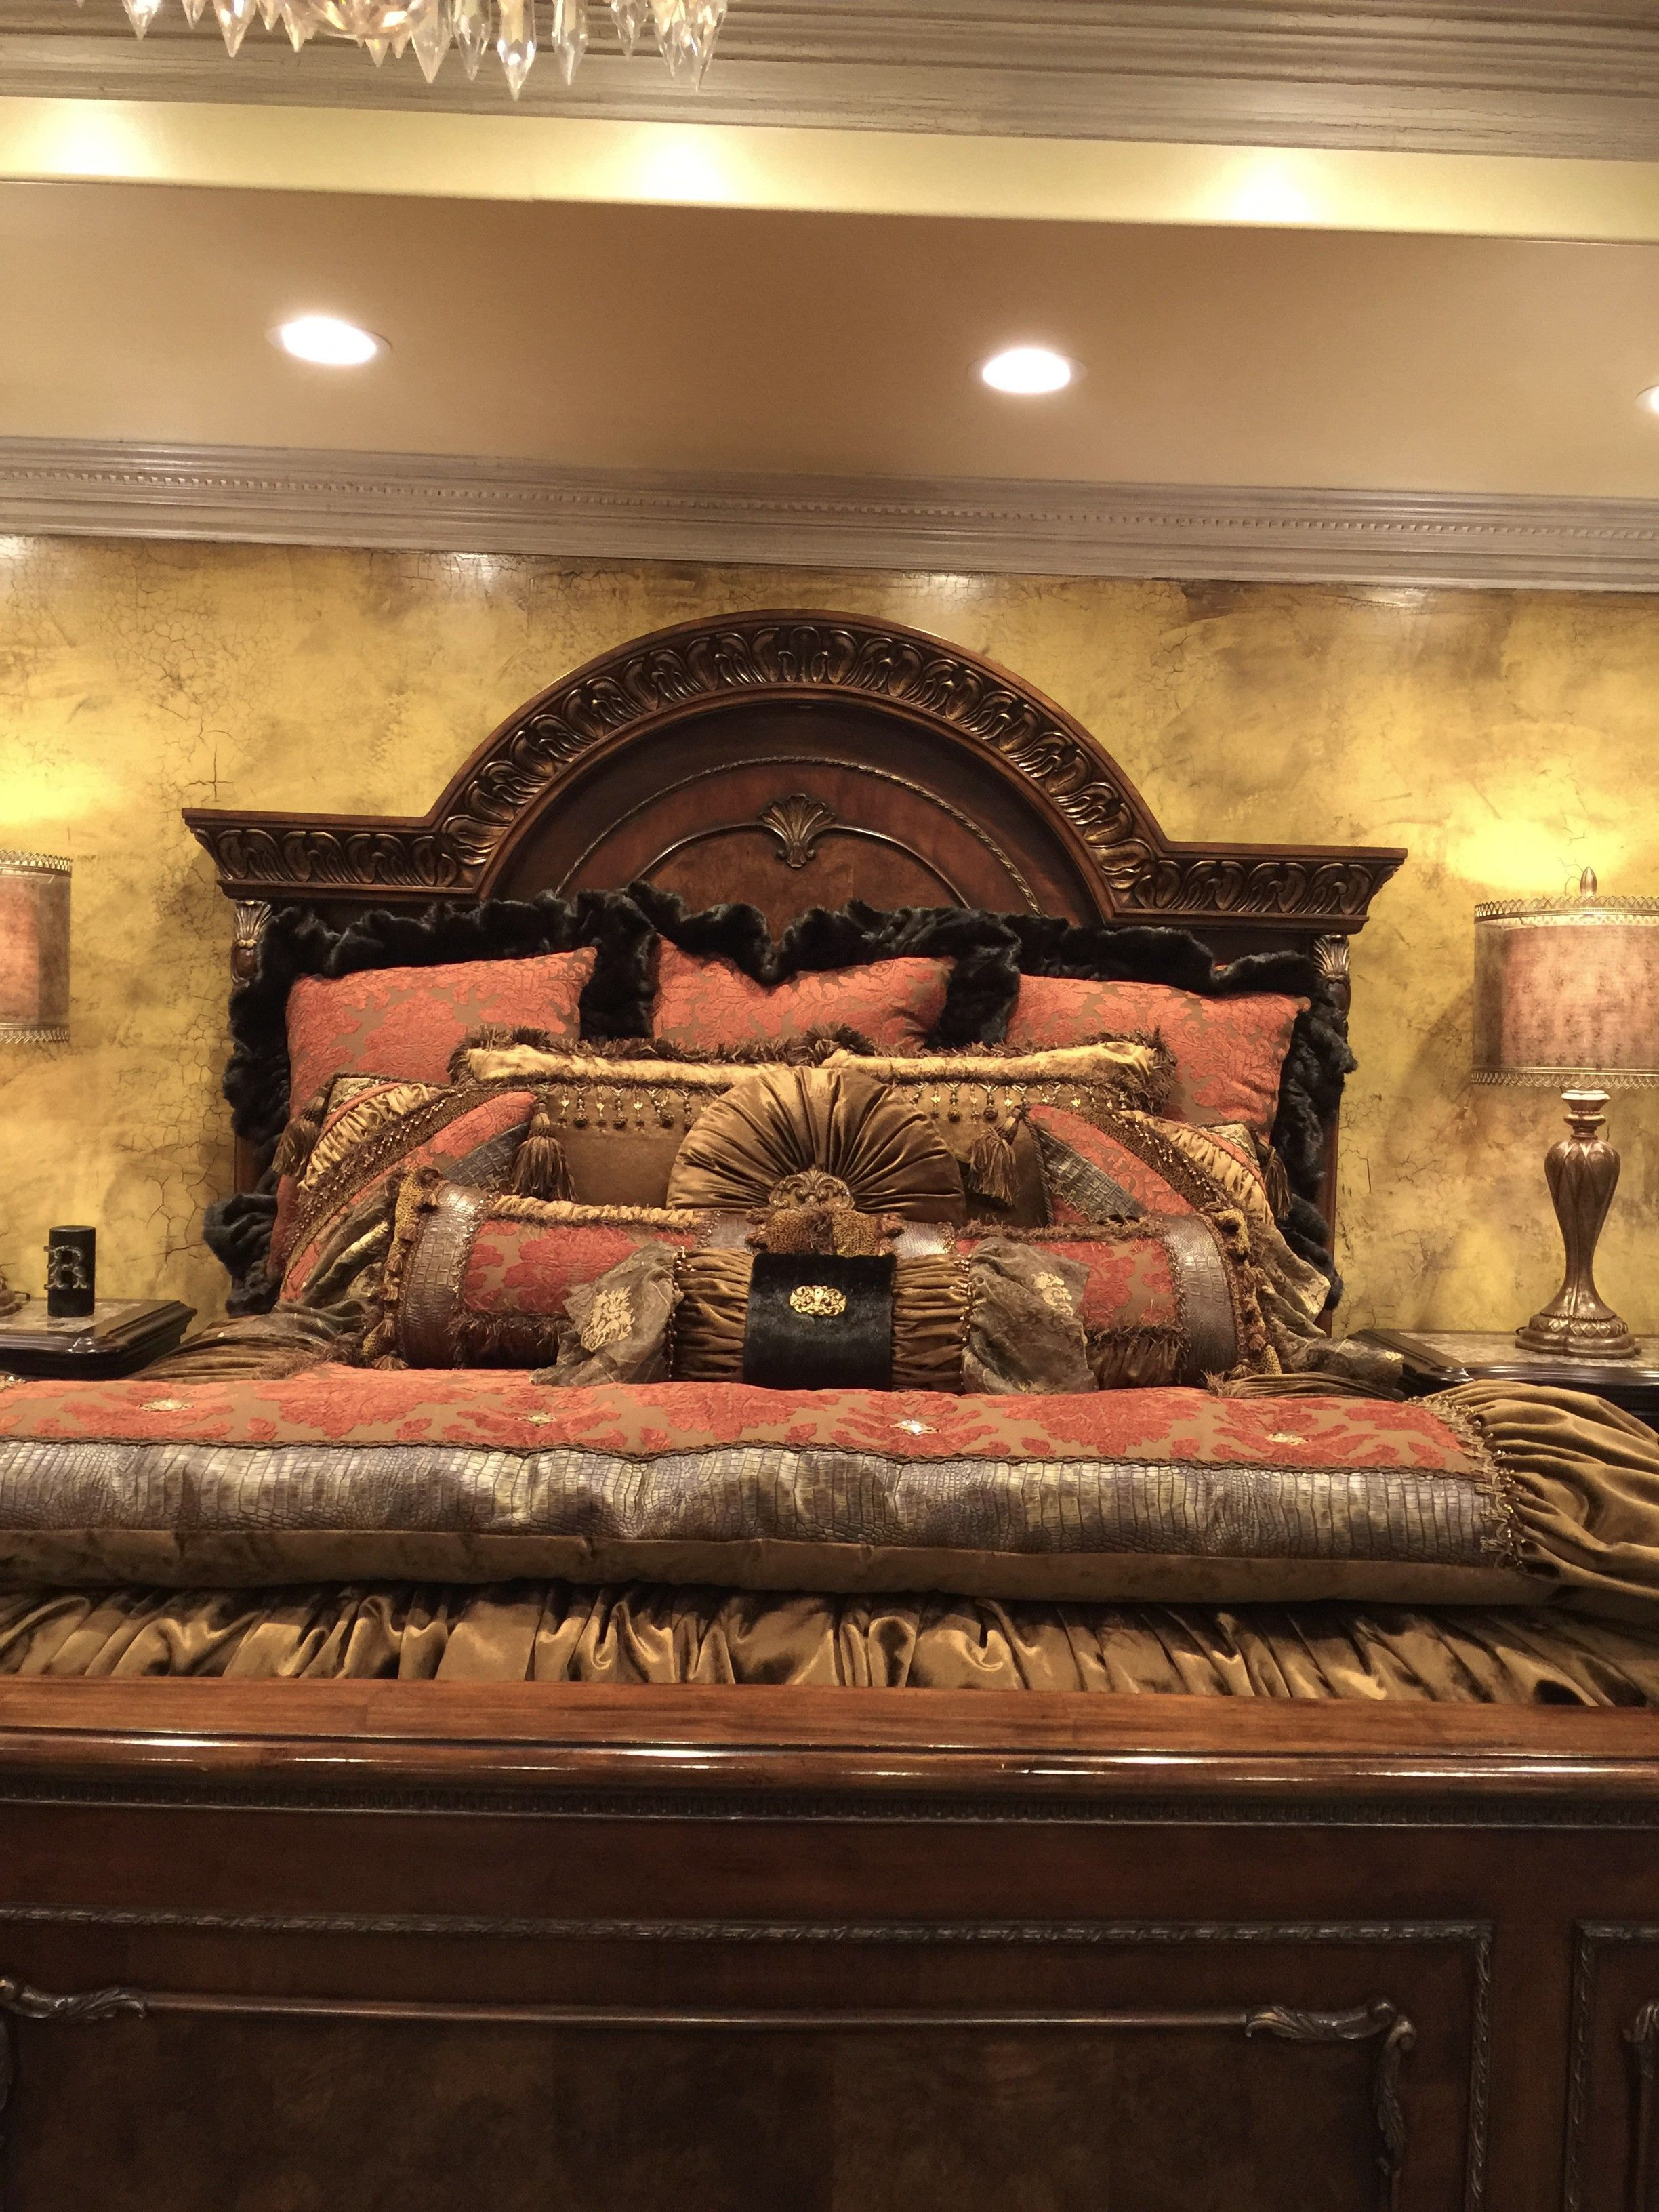 Groovy Customized Luxury Bedding And Window Treatments Luxury Download Free Architecture Designs Meptaeticmadebymaigaardcom